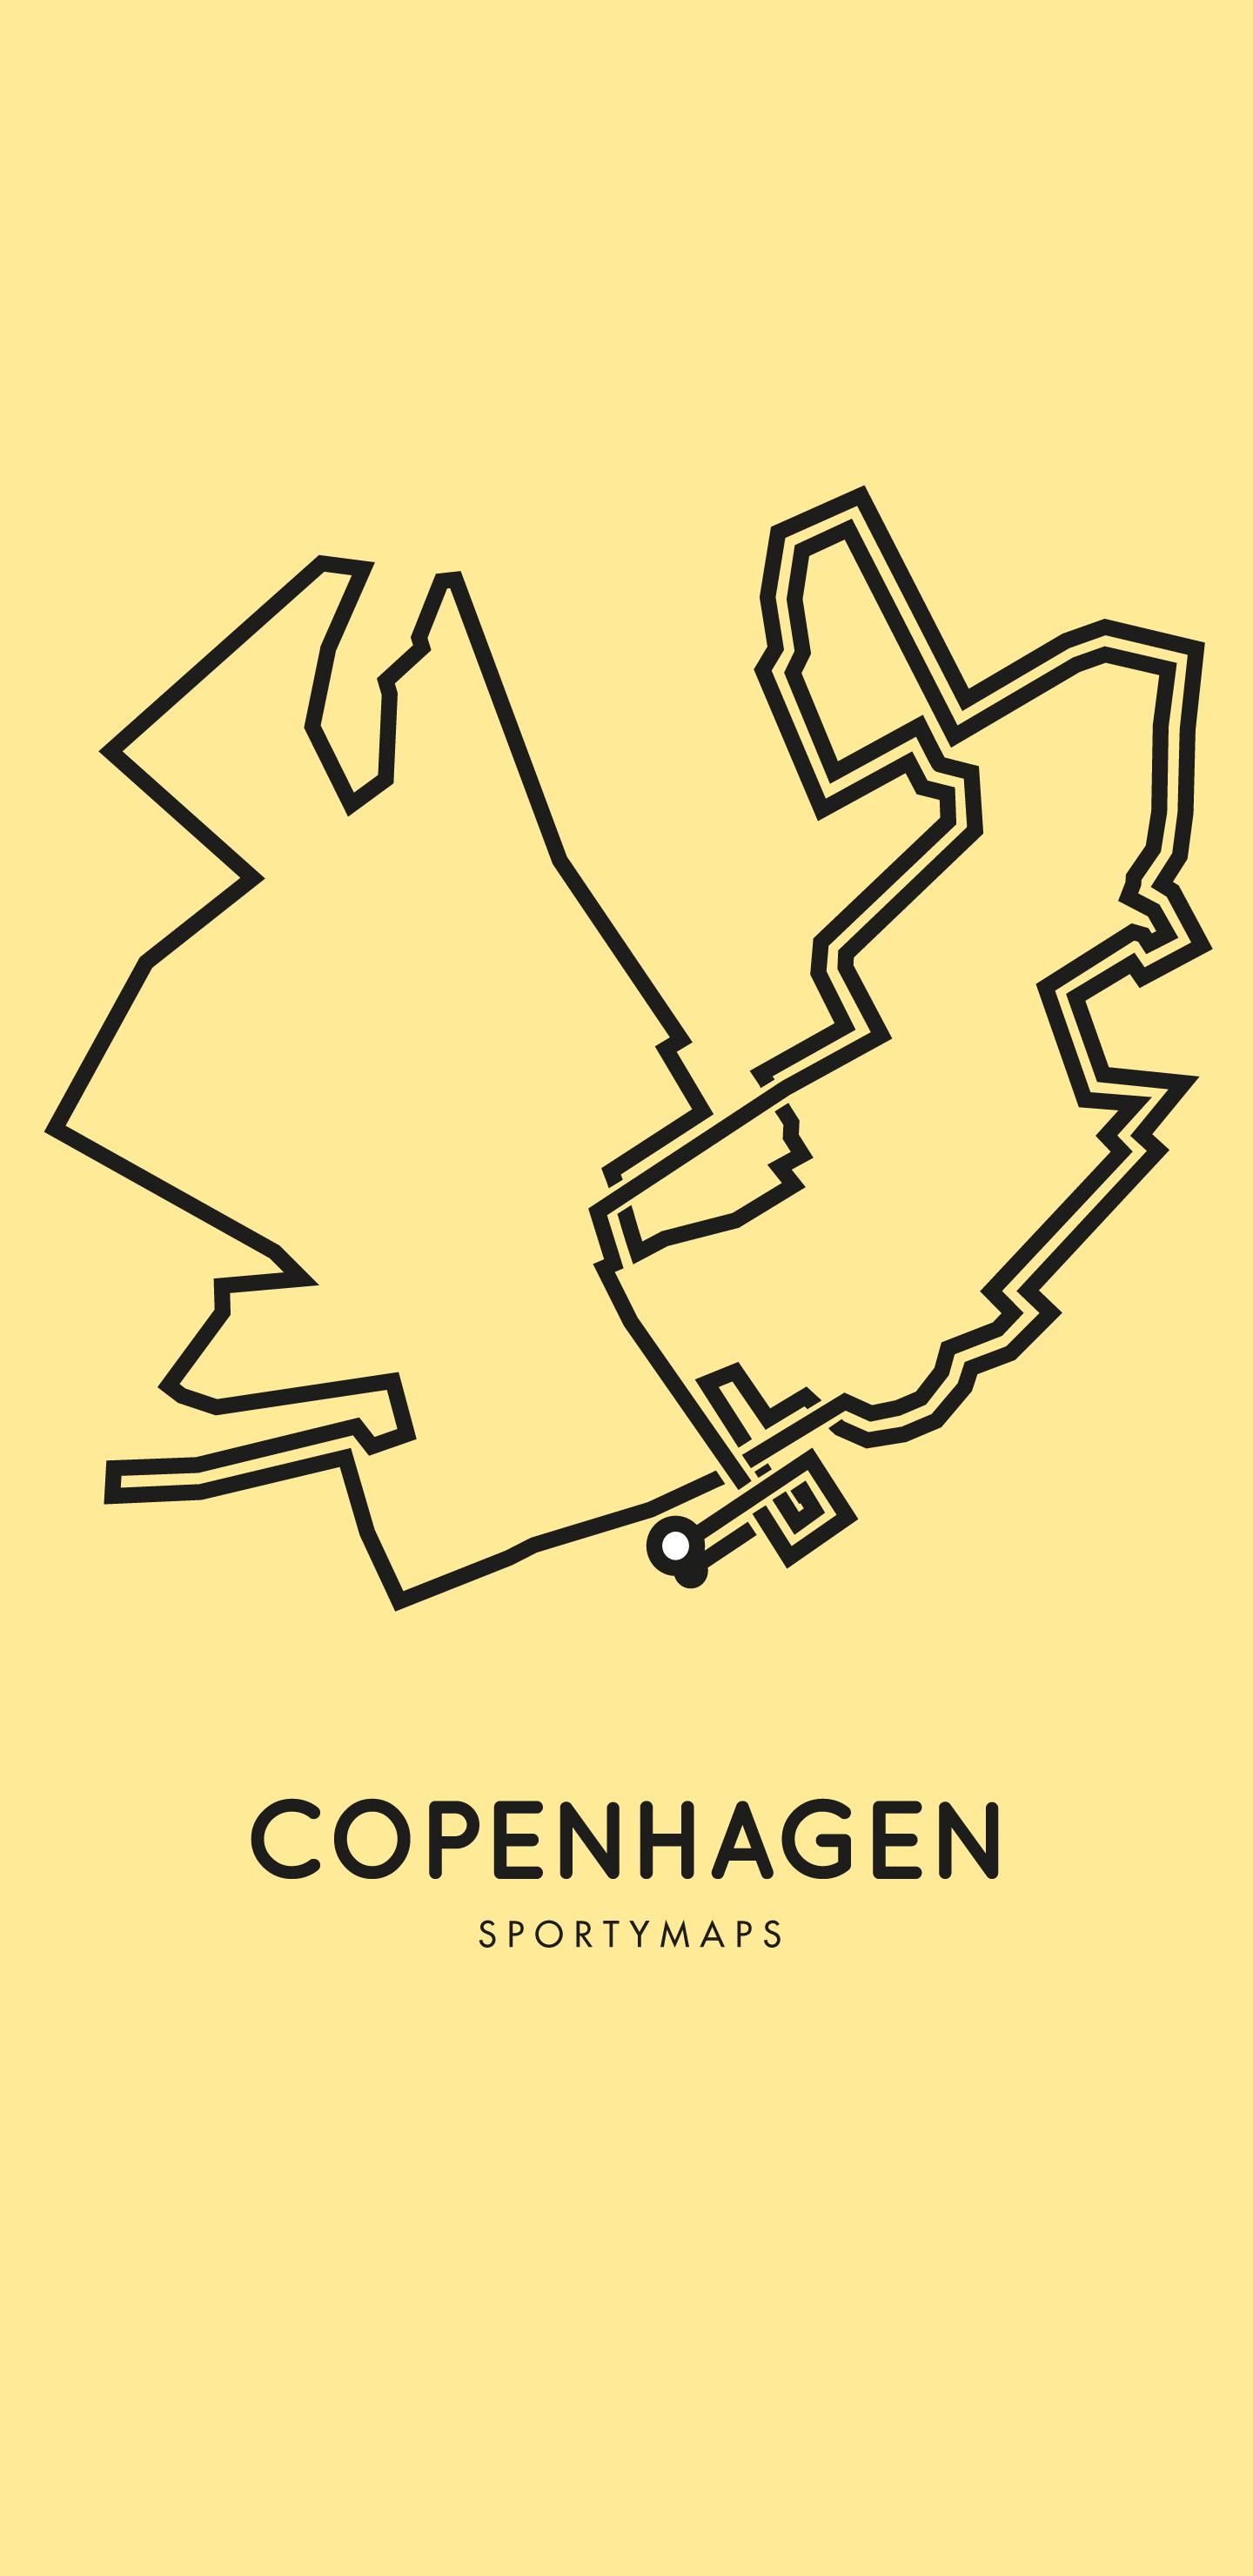 Sportymaps-Copenhagen-marathon-yellow